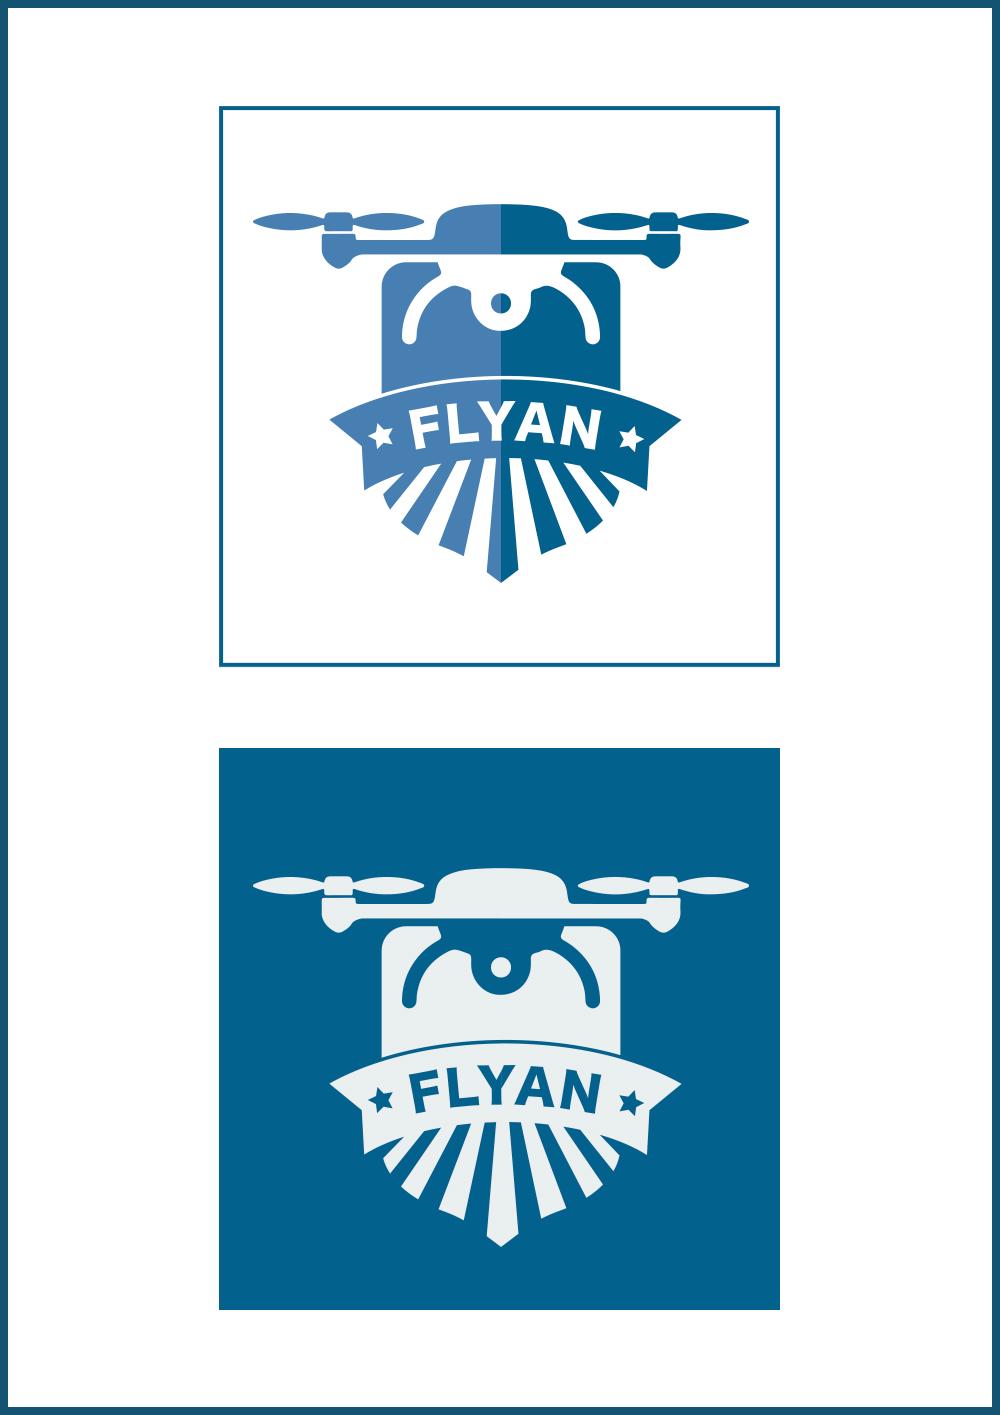 Flyan logo